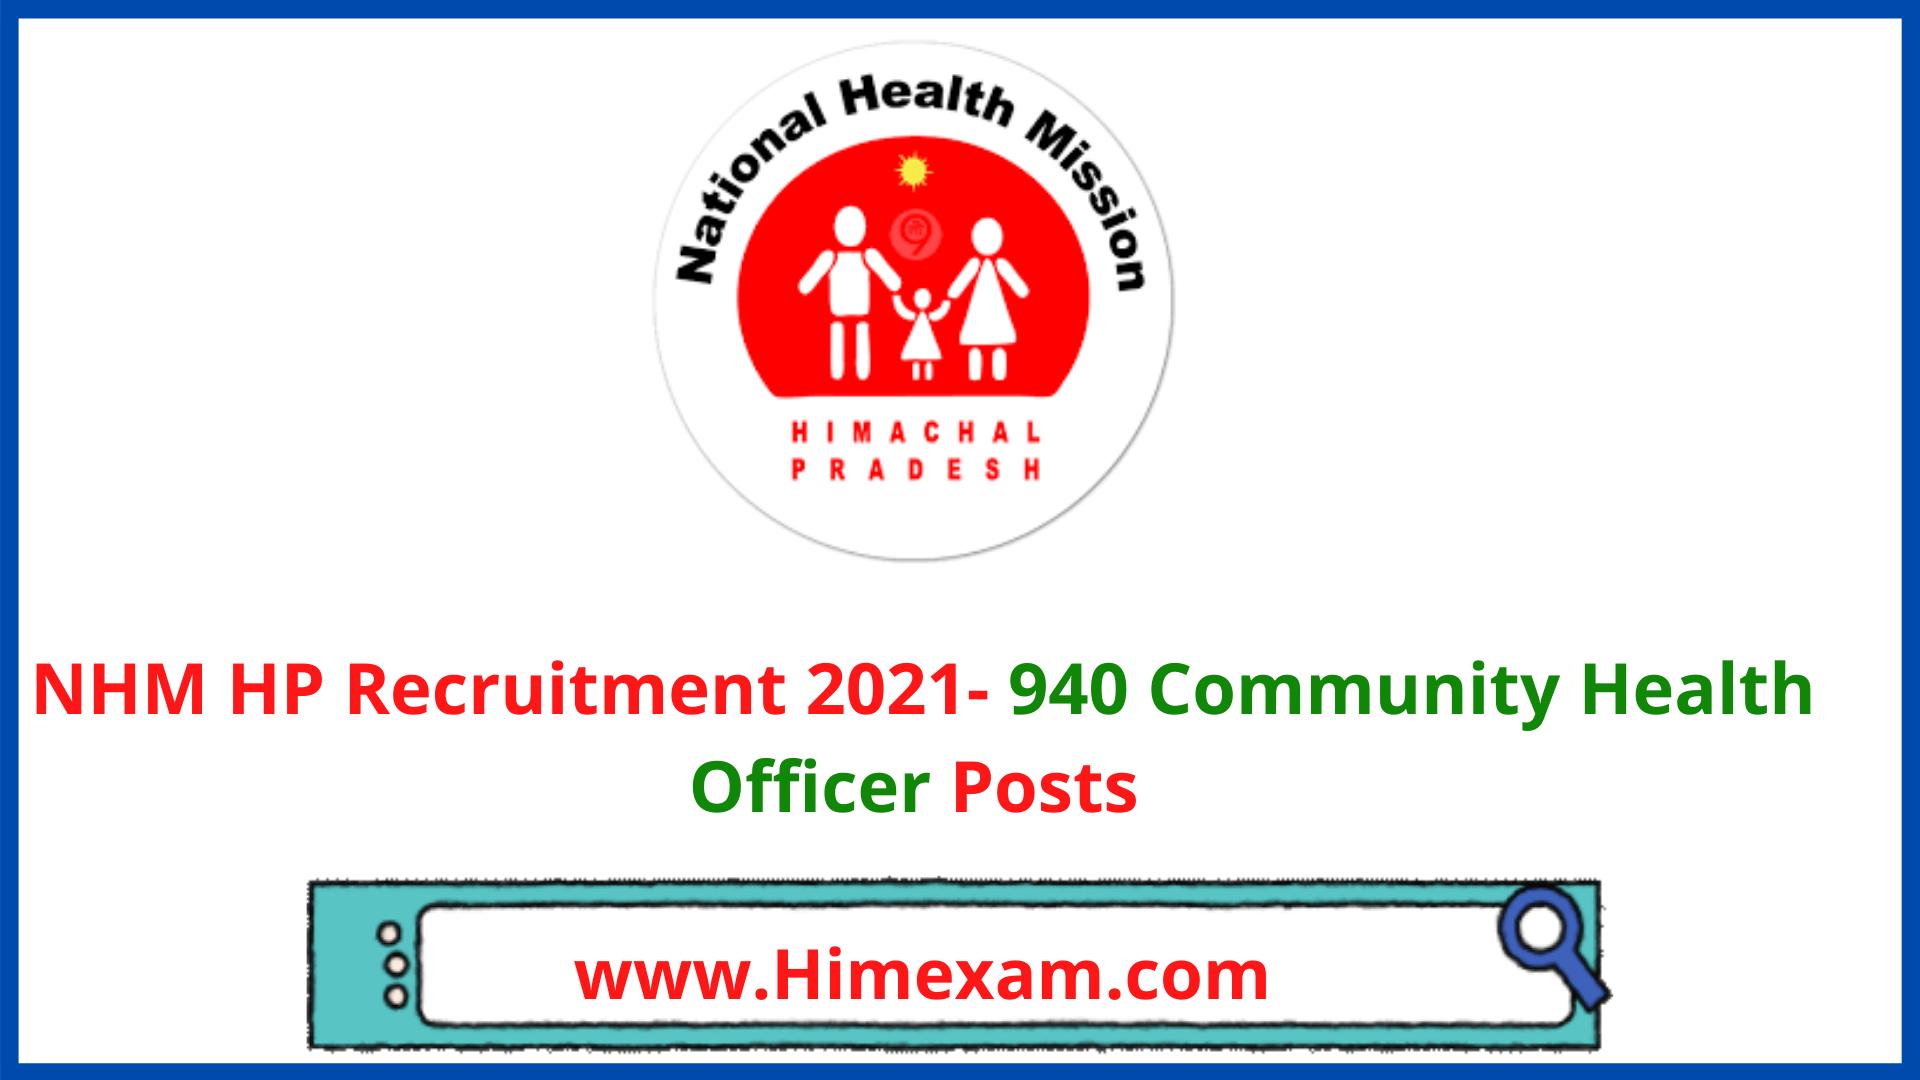 NHM HP Recruitment 2021- 940 Community Health Officer Posts